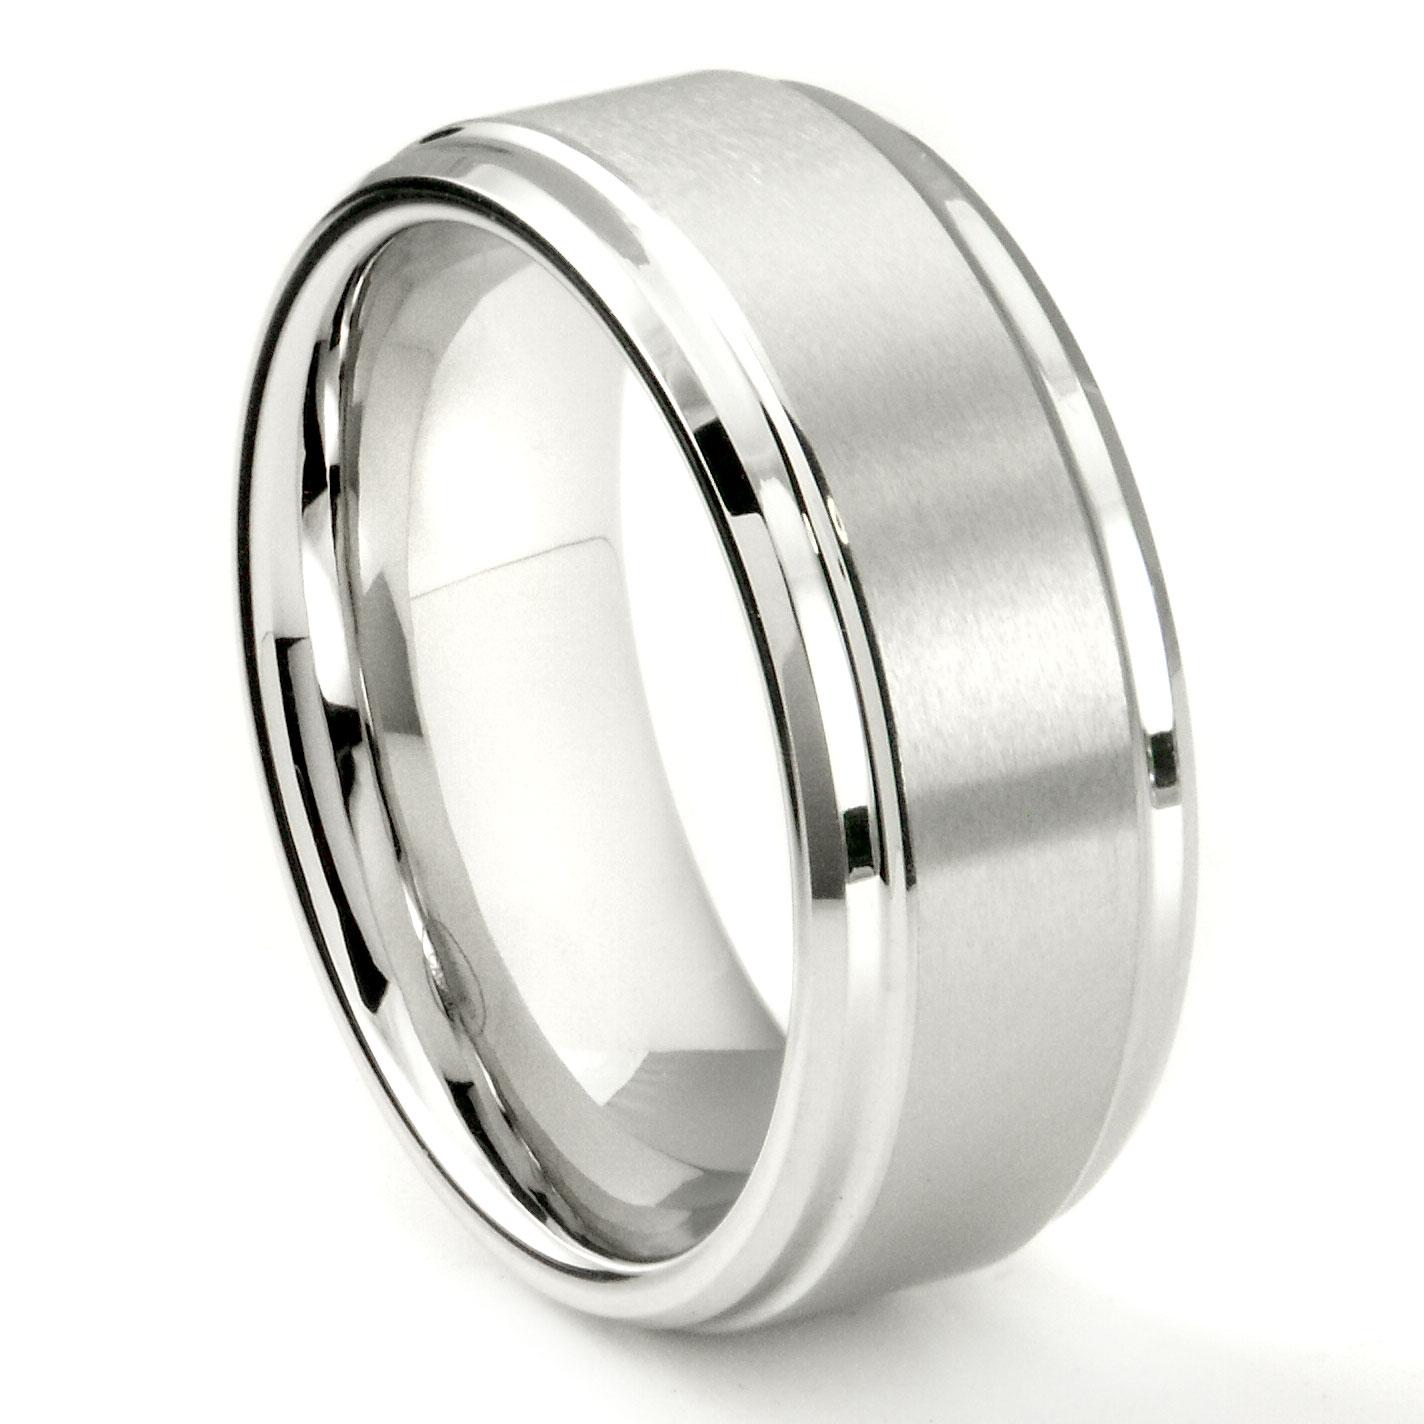 White Tungsten Carbide 9mm Brush Center Wedding Band Ring